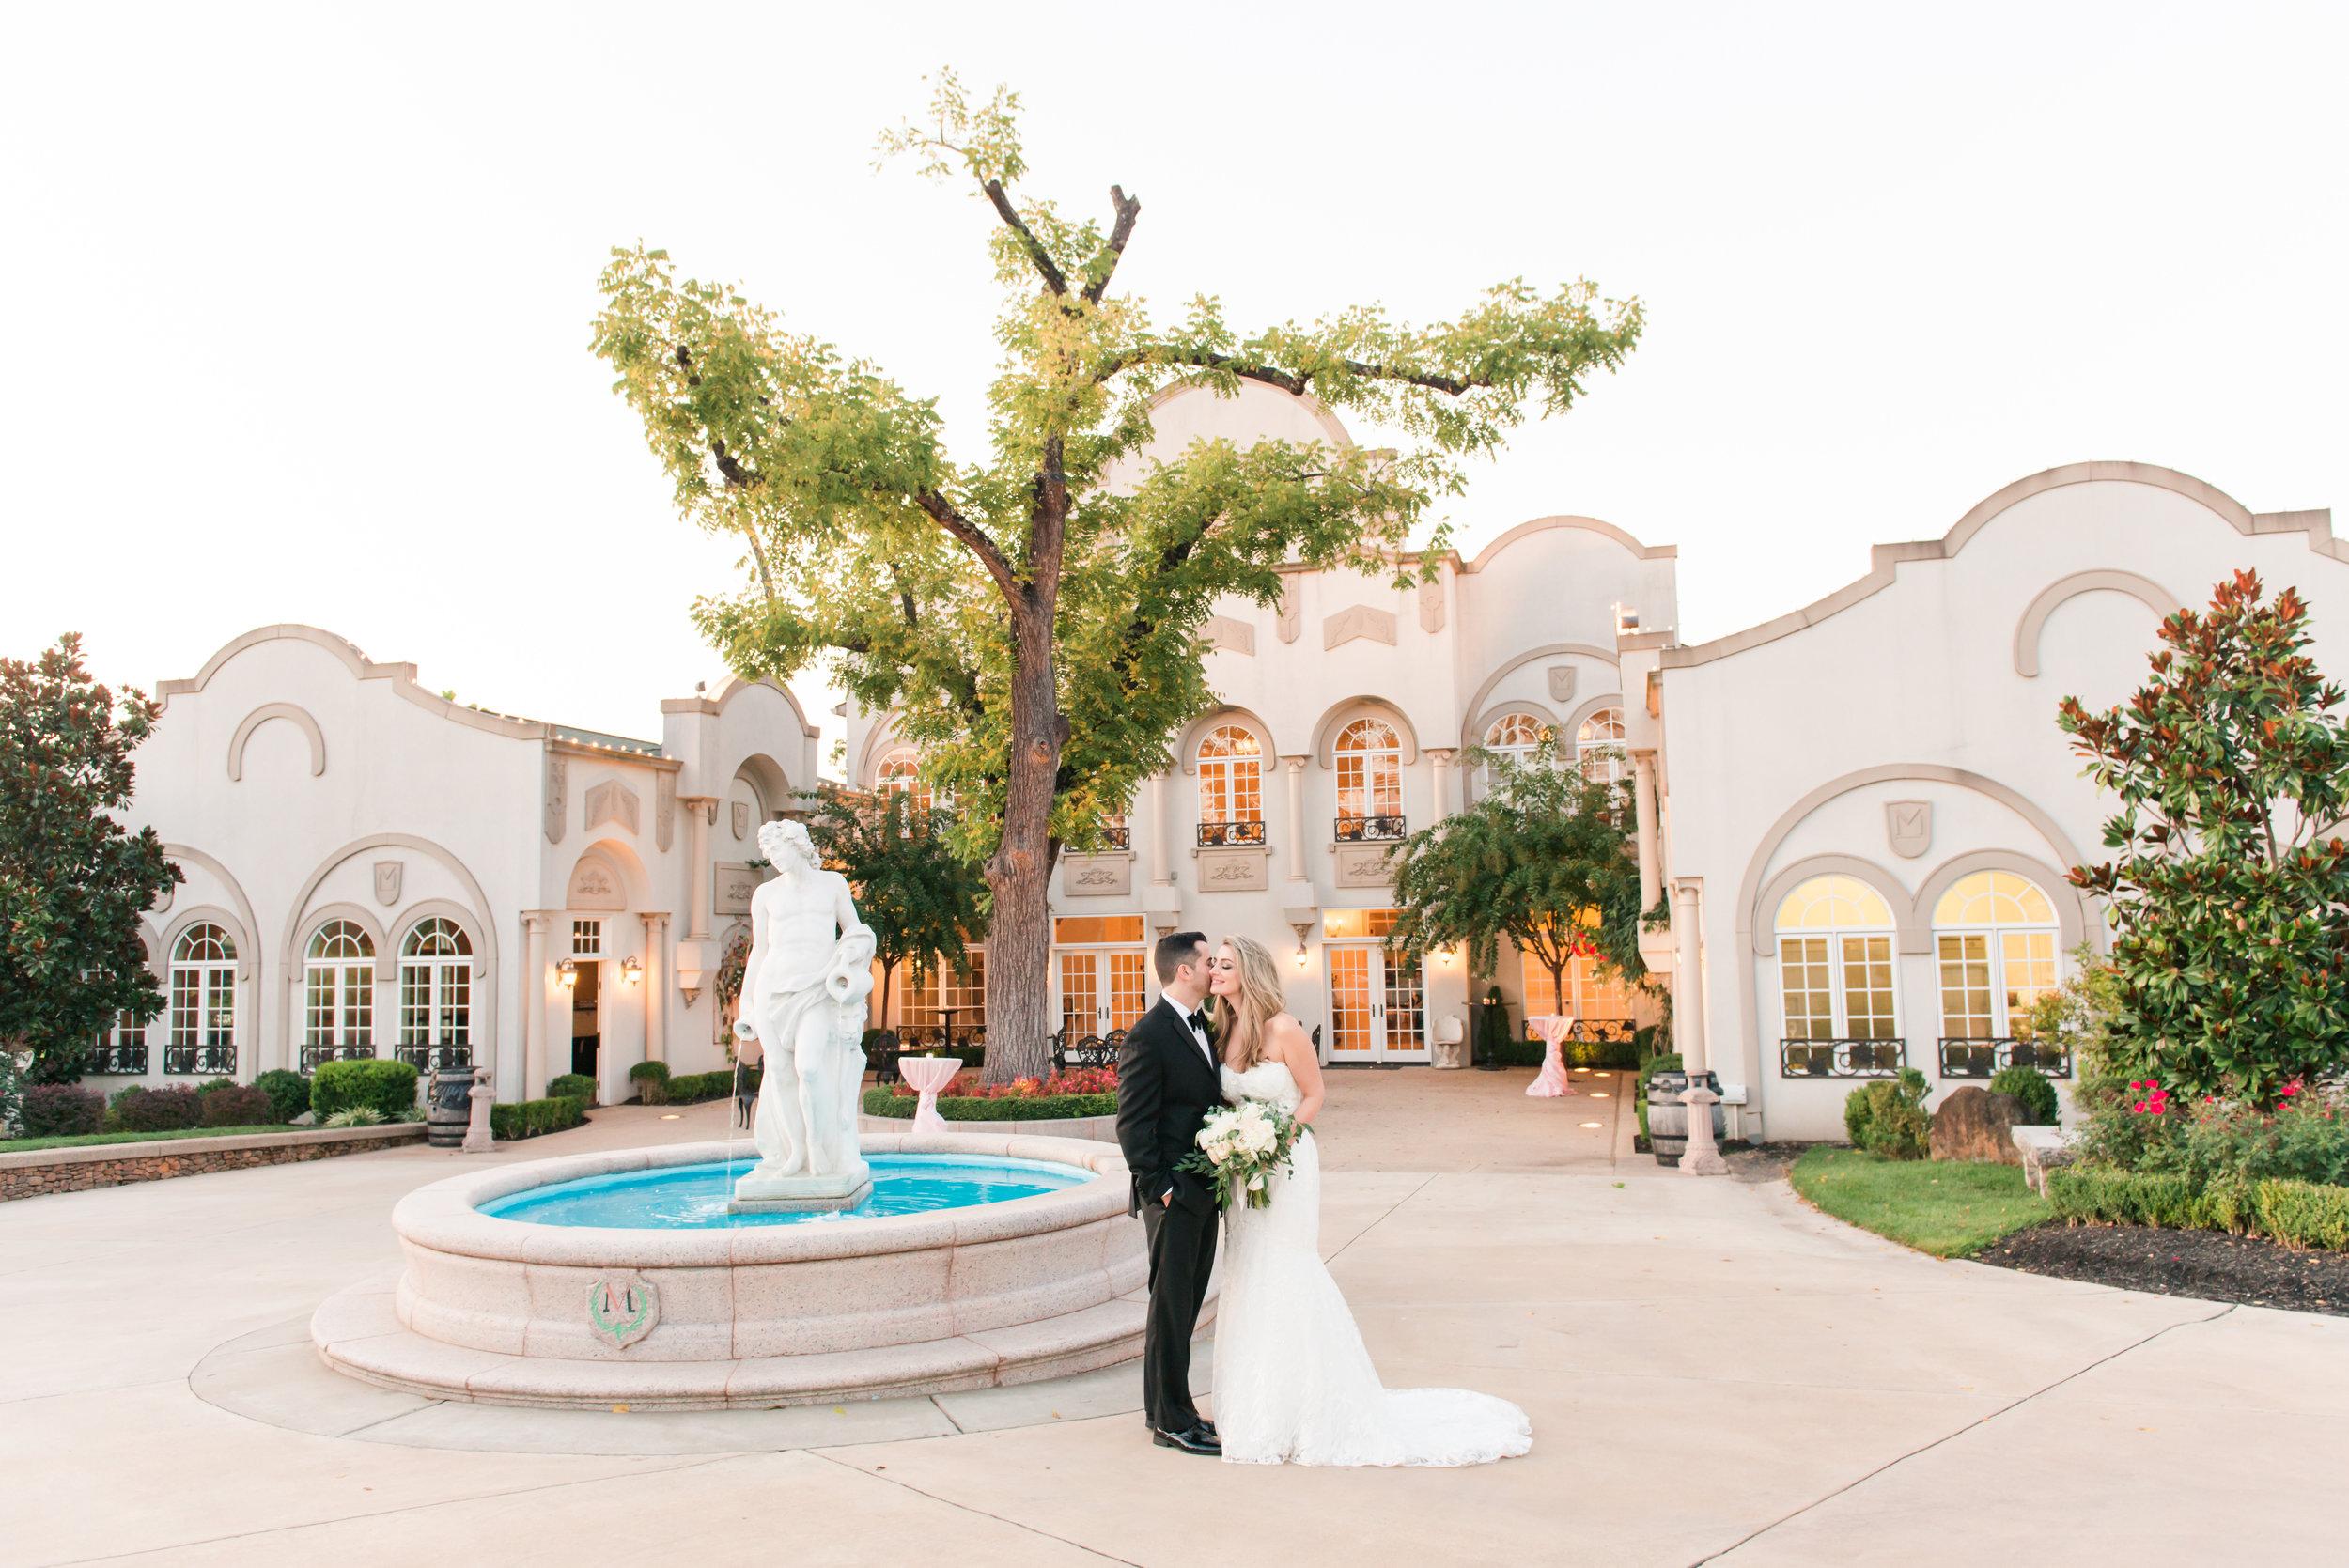 MORAIS VINEYARDS WEDDING A BEYOUTIFUL FETE EVENTS & DESIGN  - VIRGINIA AND DC WEDDING PLANNER 03.jpg